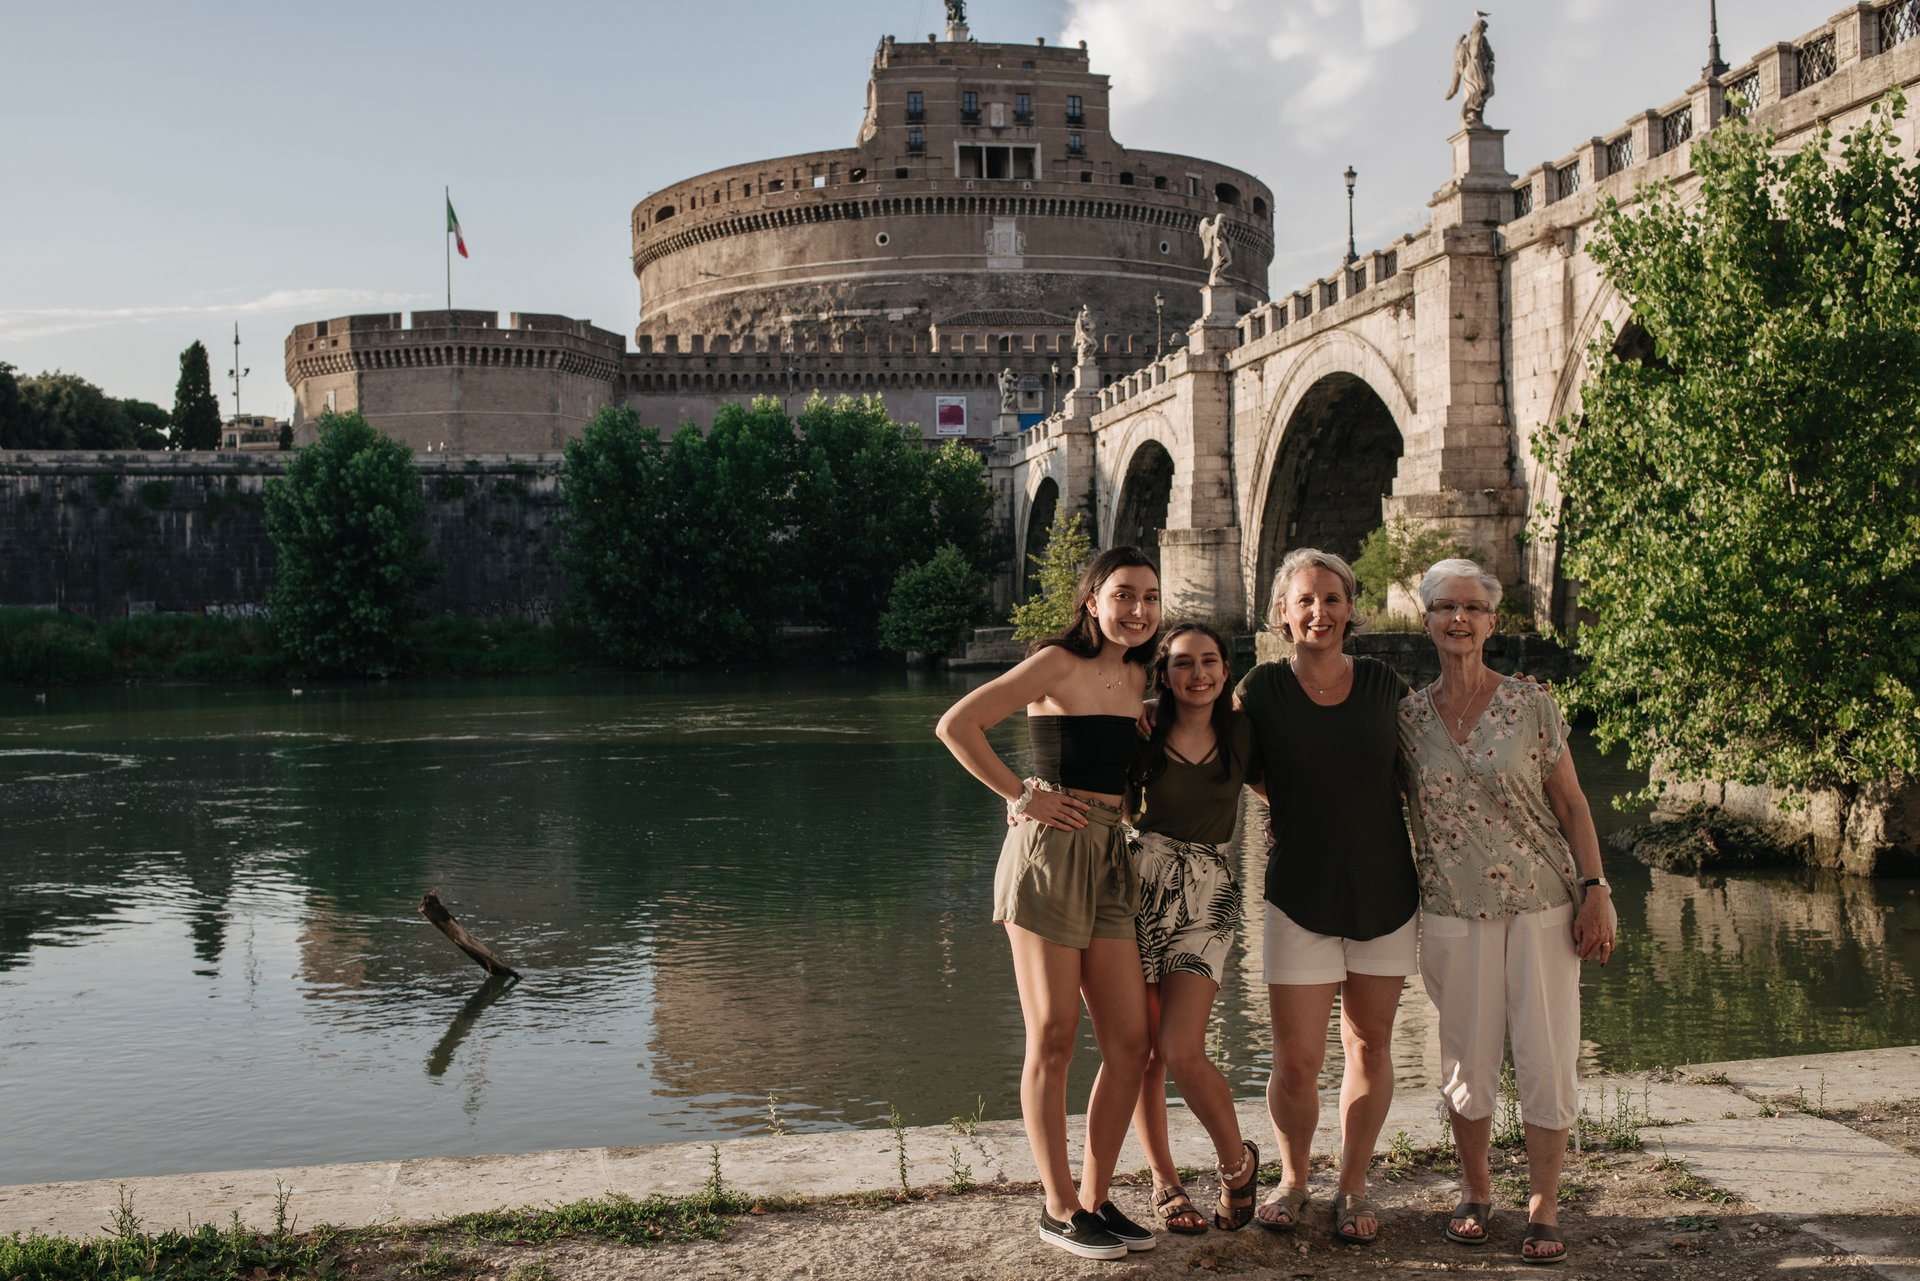 Rome-Italy-travel-story-Flytographer-1